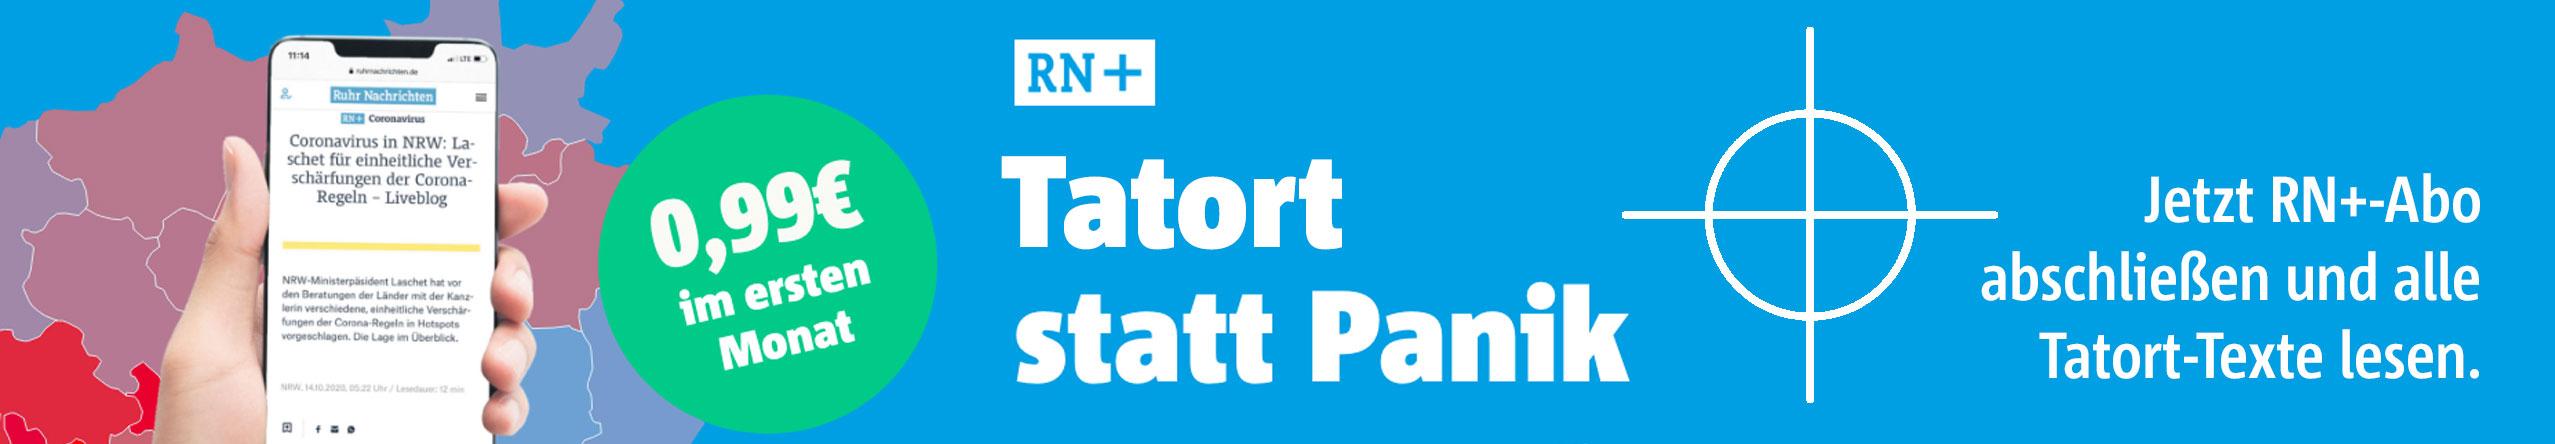 Tatort50